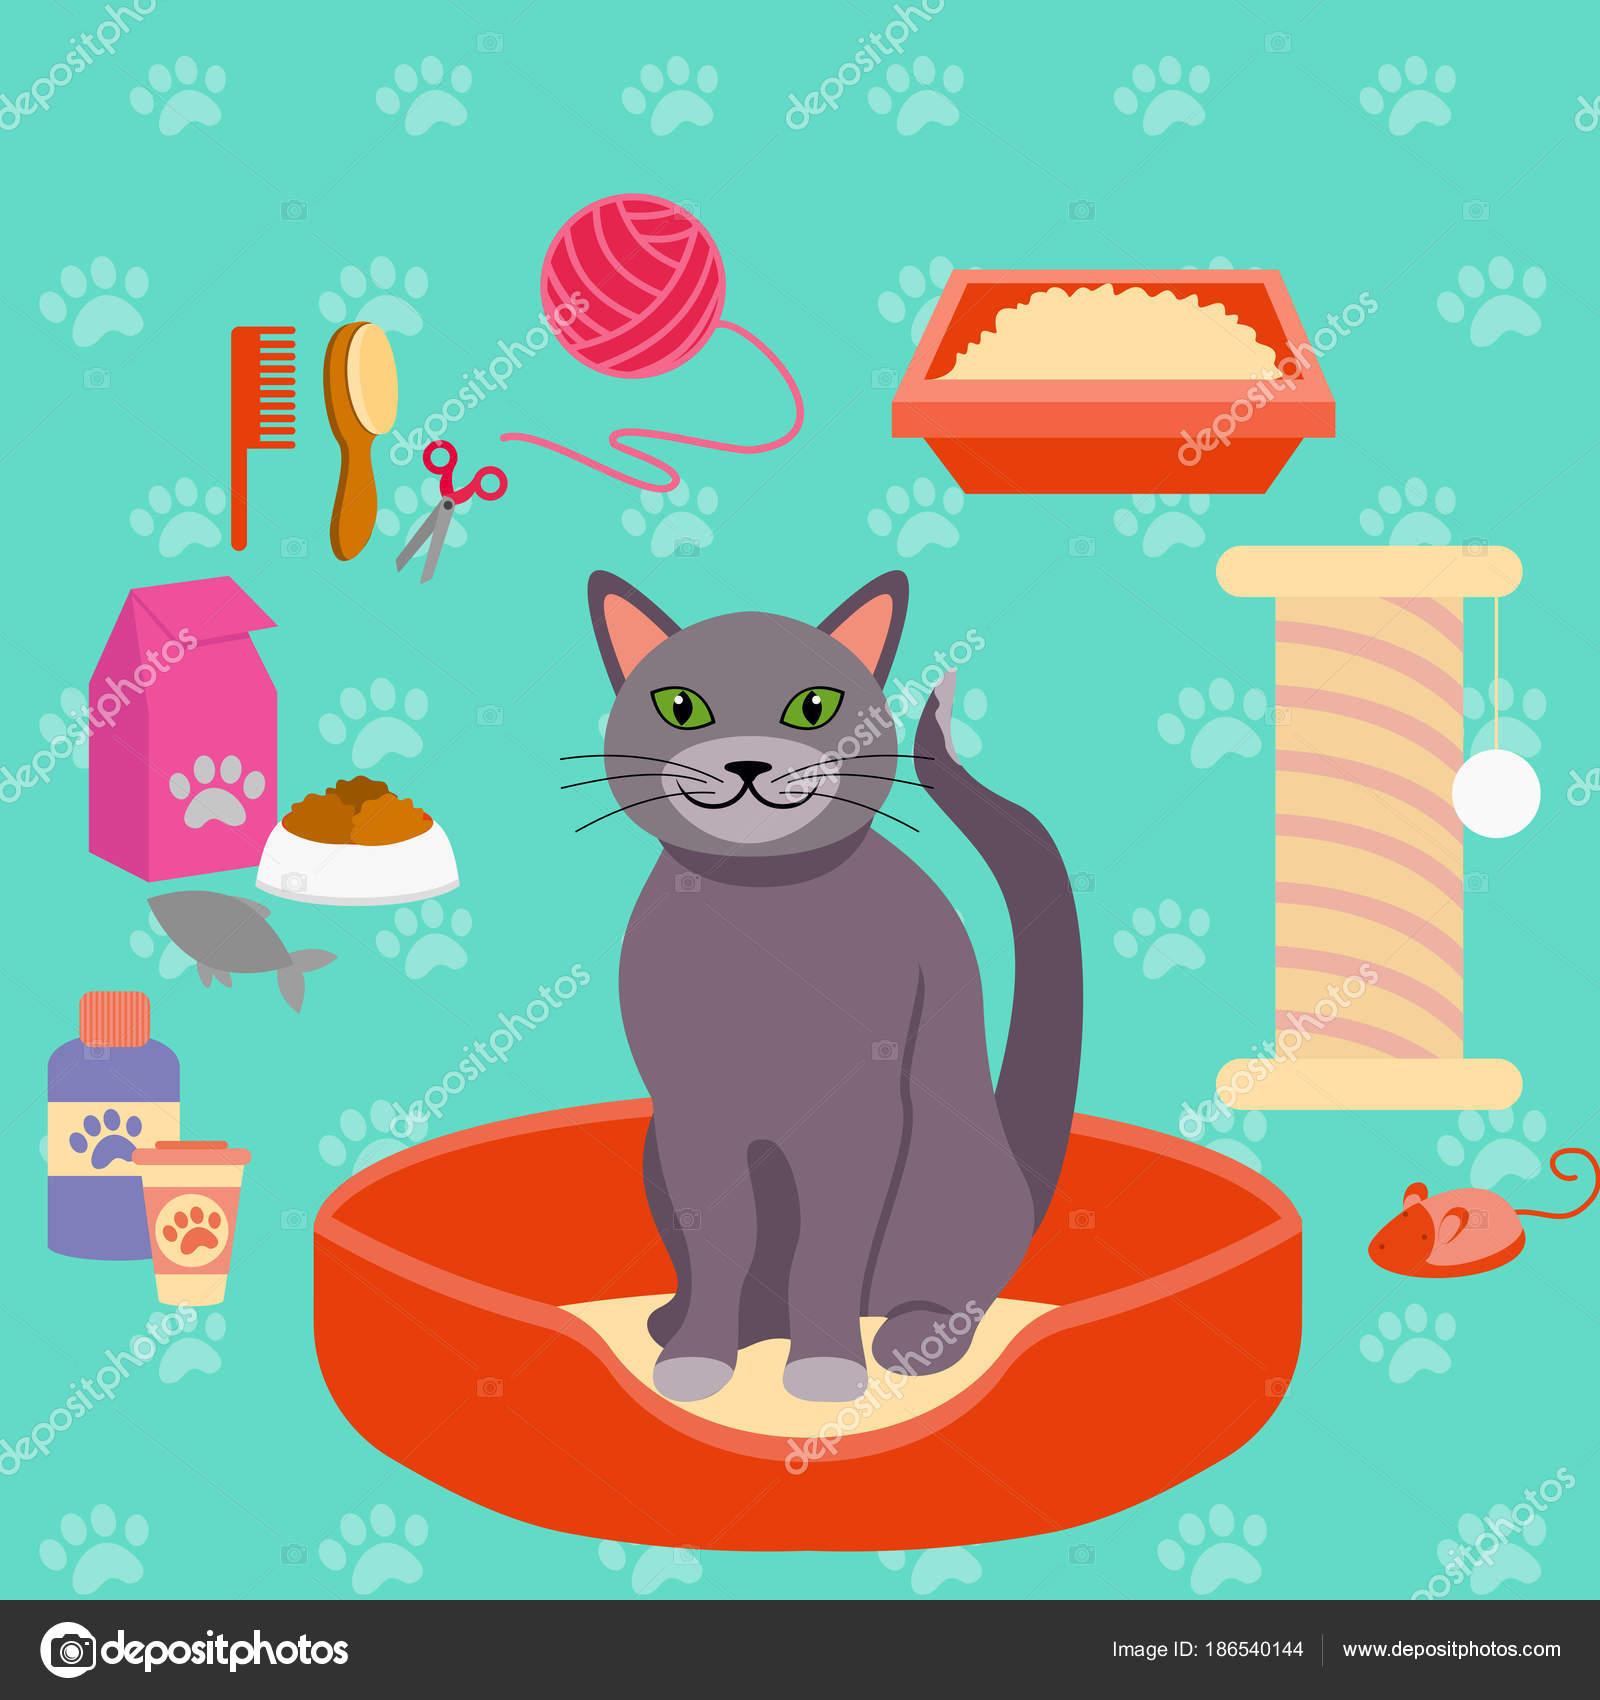 5dc7fc54defd Vector εικονογράφηση της γάτας με διαφορετικά αξεσουάρ Φροντίδας Pet για  τις γάτες. συλλογή εικόνων σε επίπεδη στυλ– εικονογράφηση αρχείου